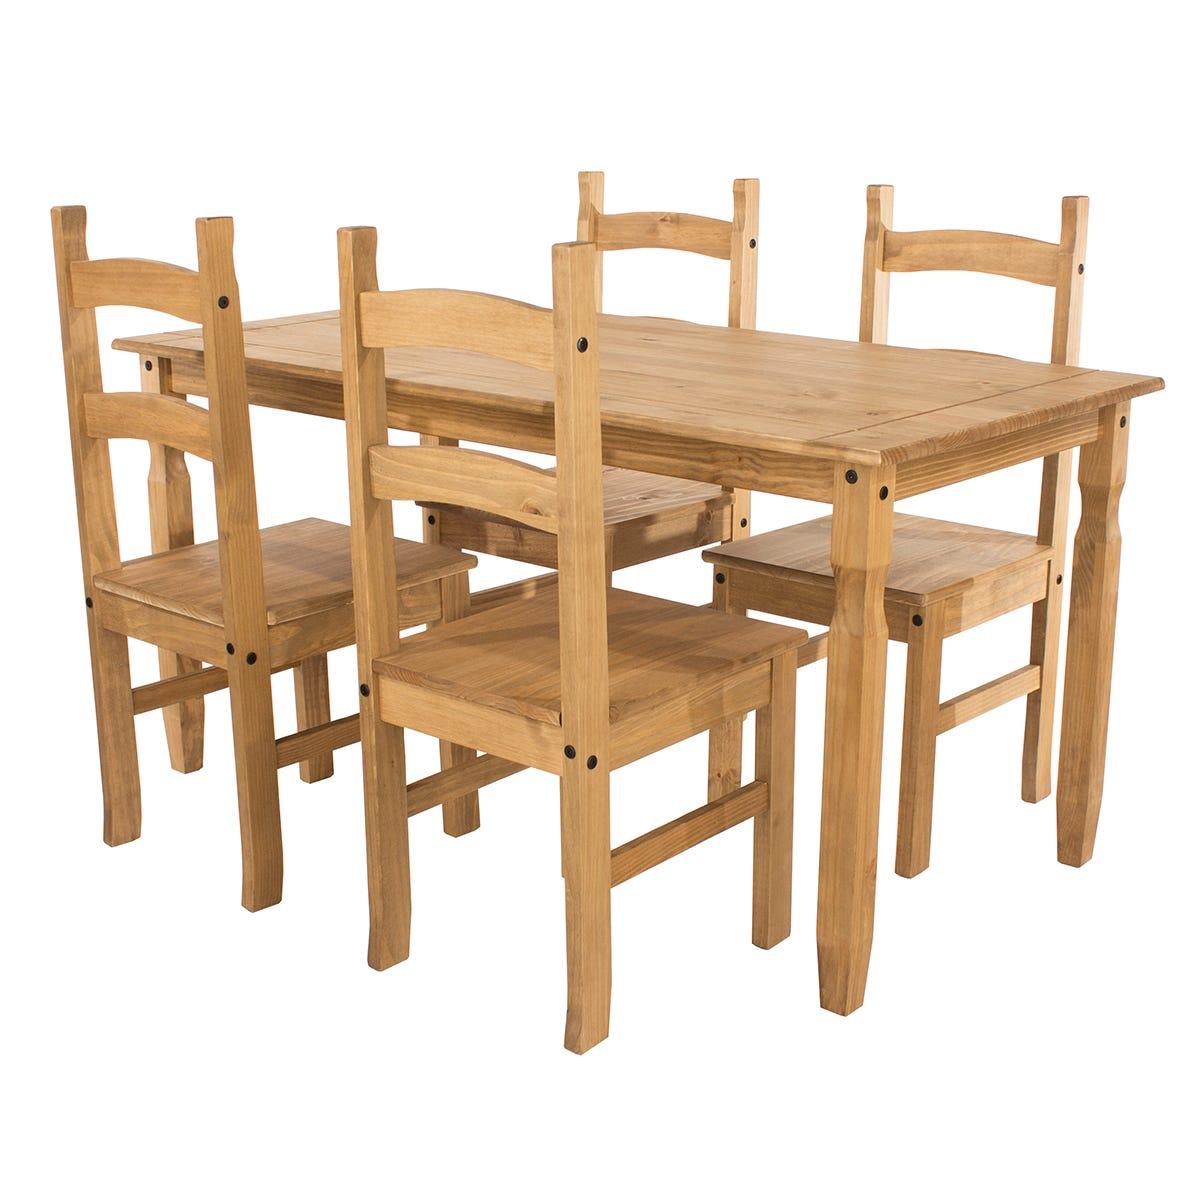 Halea Large Rectangular Dining Table & 4 Chairs